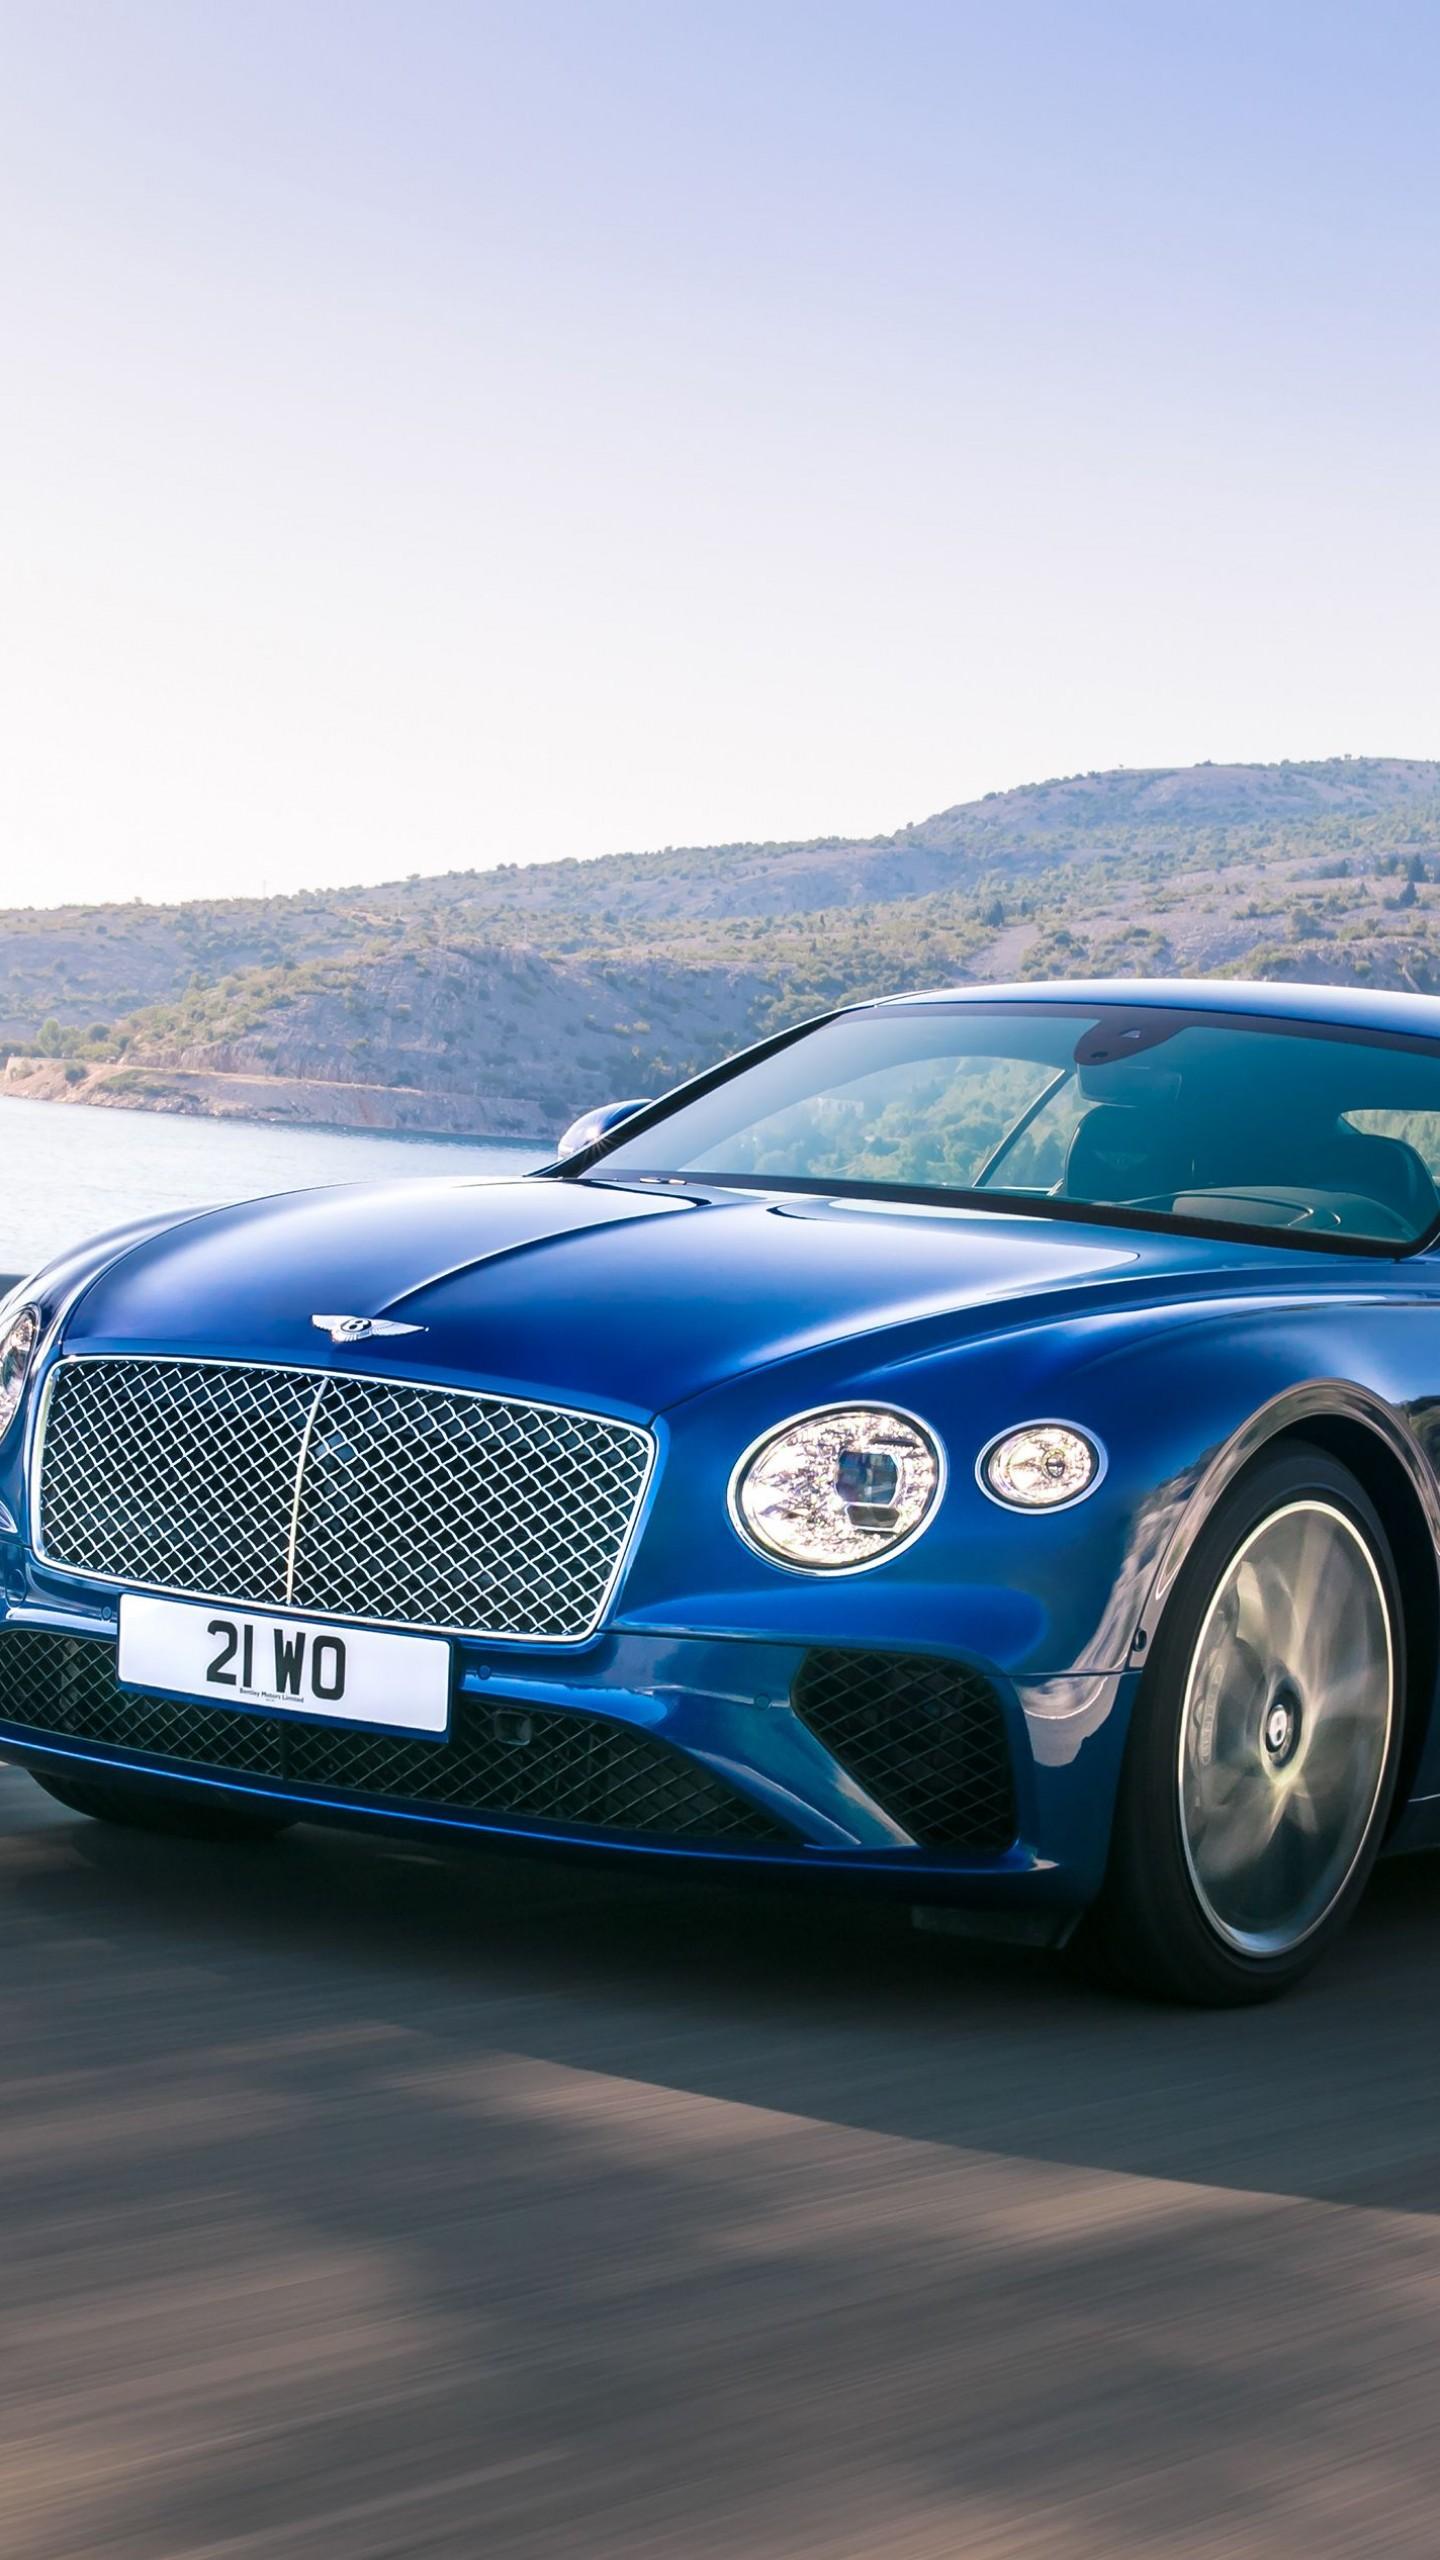 Luxury Iphone Wallpaper Wallpaper Bentley Continental Gt 2019 Cars 4k Cars